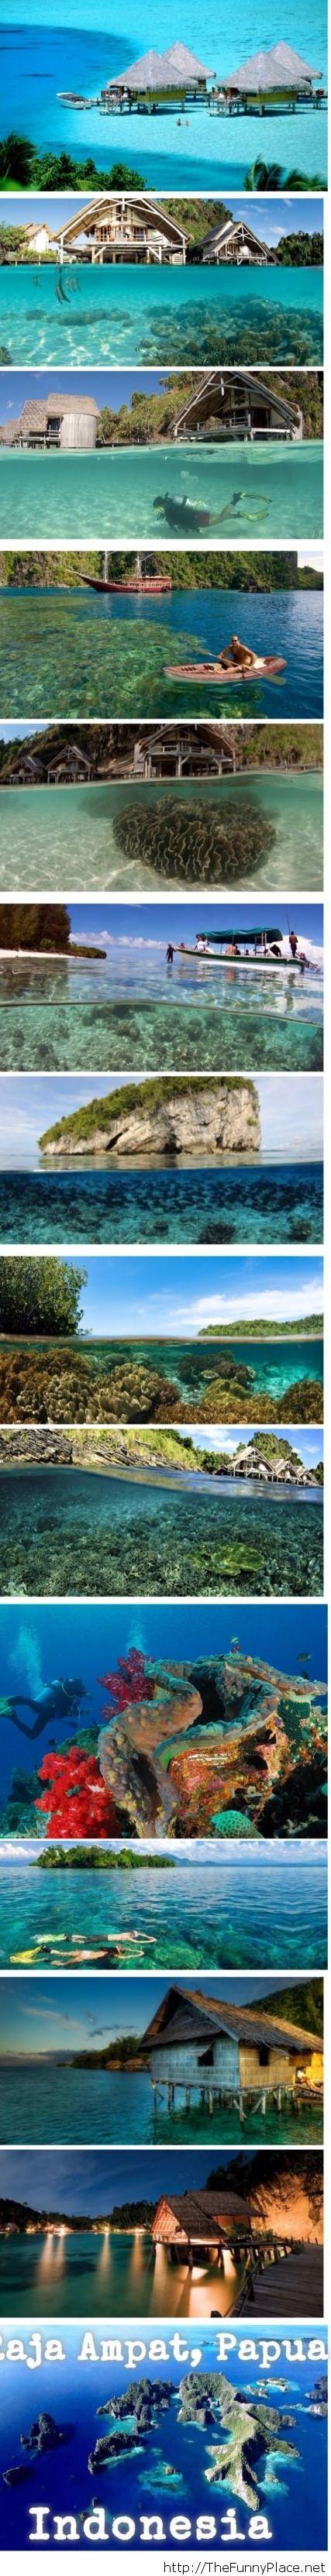 Indonesia, Raja Ampat, Papua awesome images